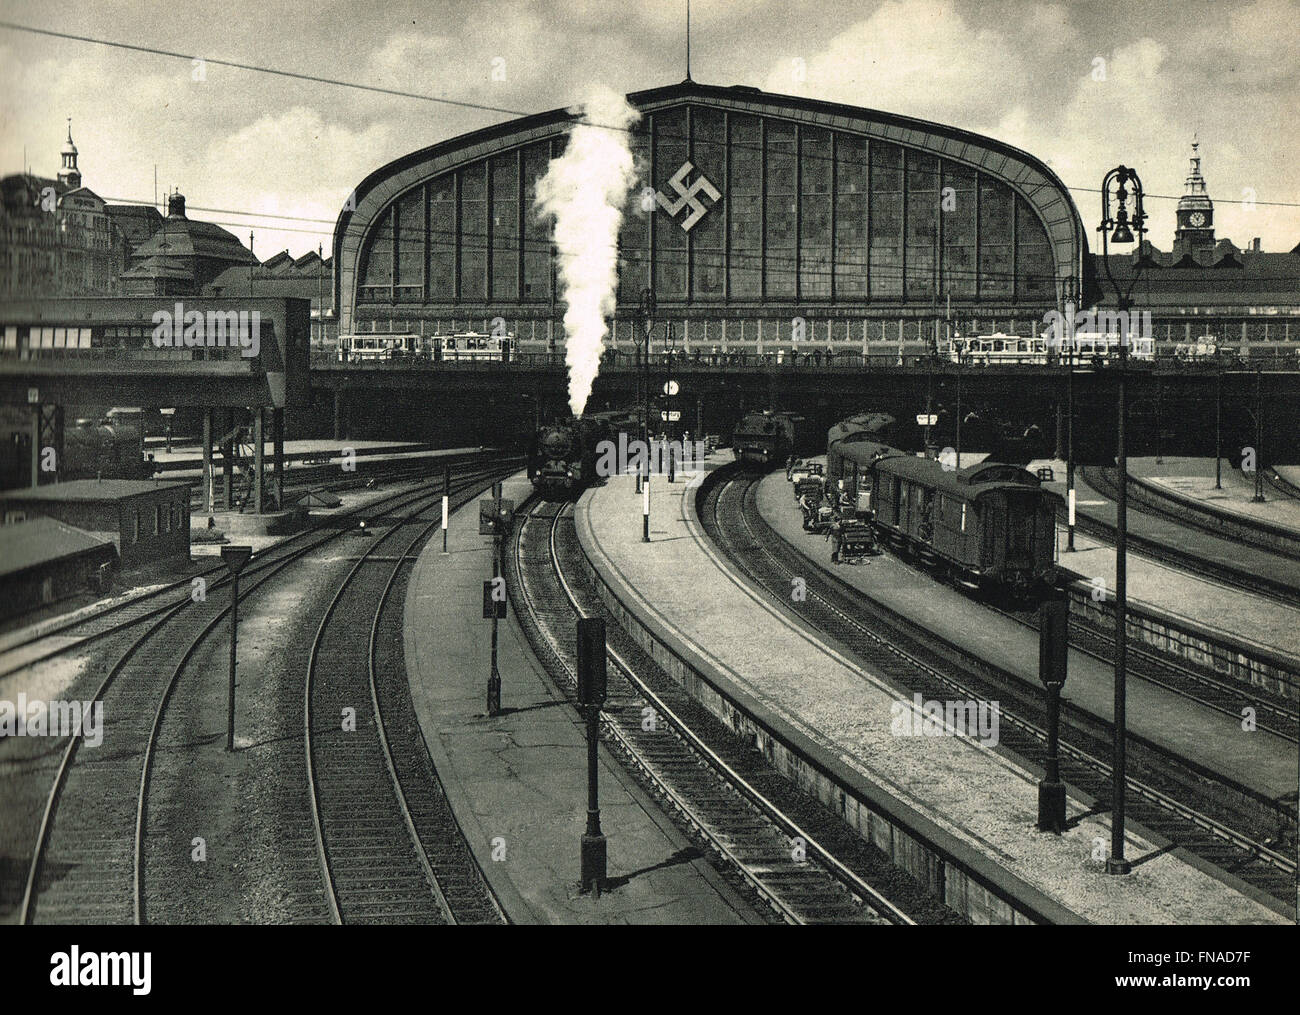 Hauptbahnhof Hamburg Railway Station with Nazi Swastika emblem circa 1938 - Stock Image